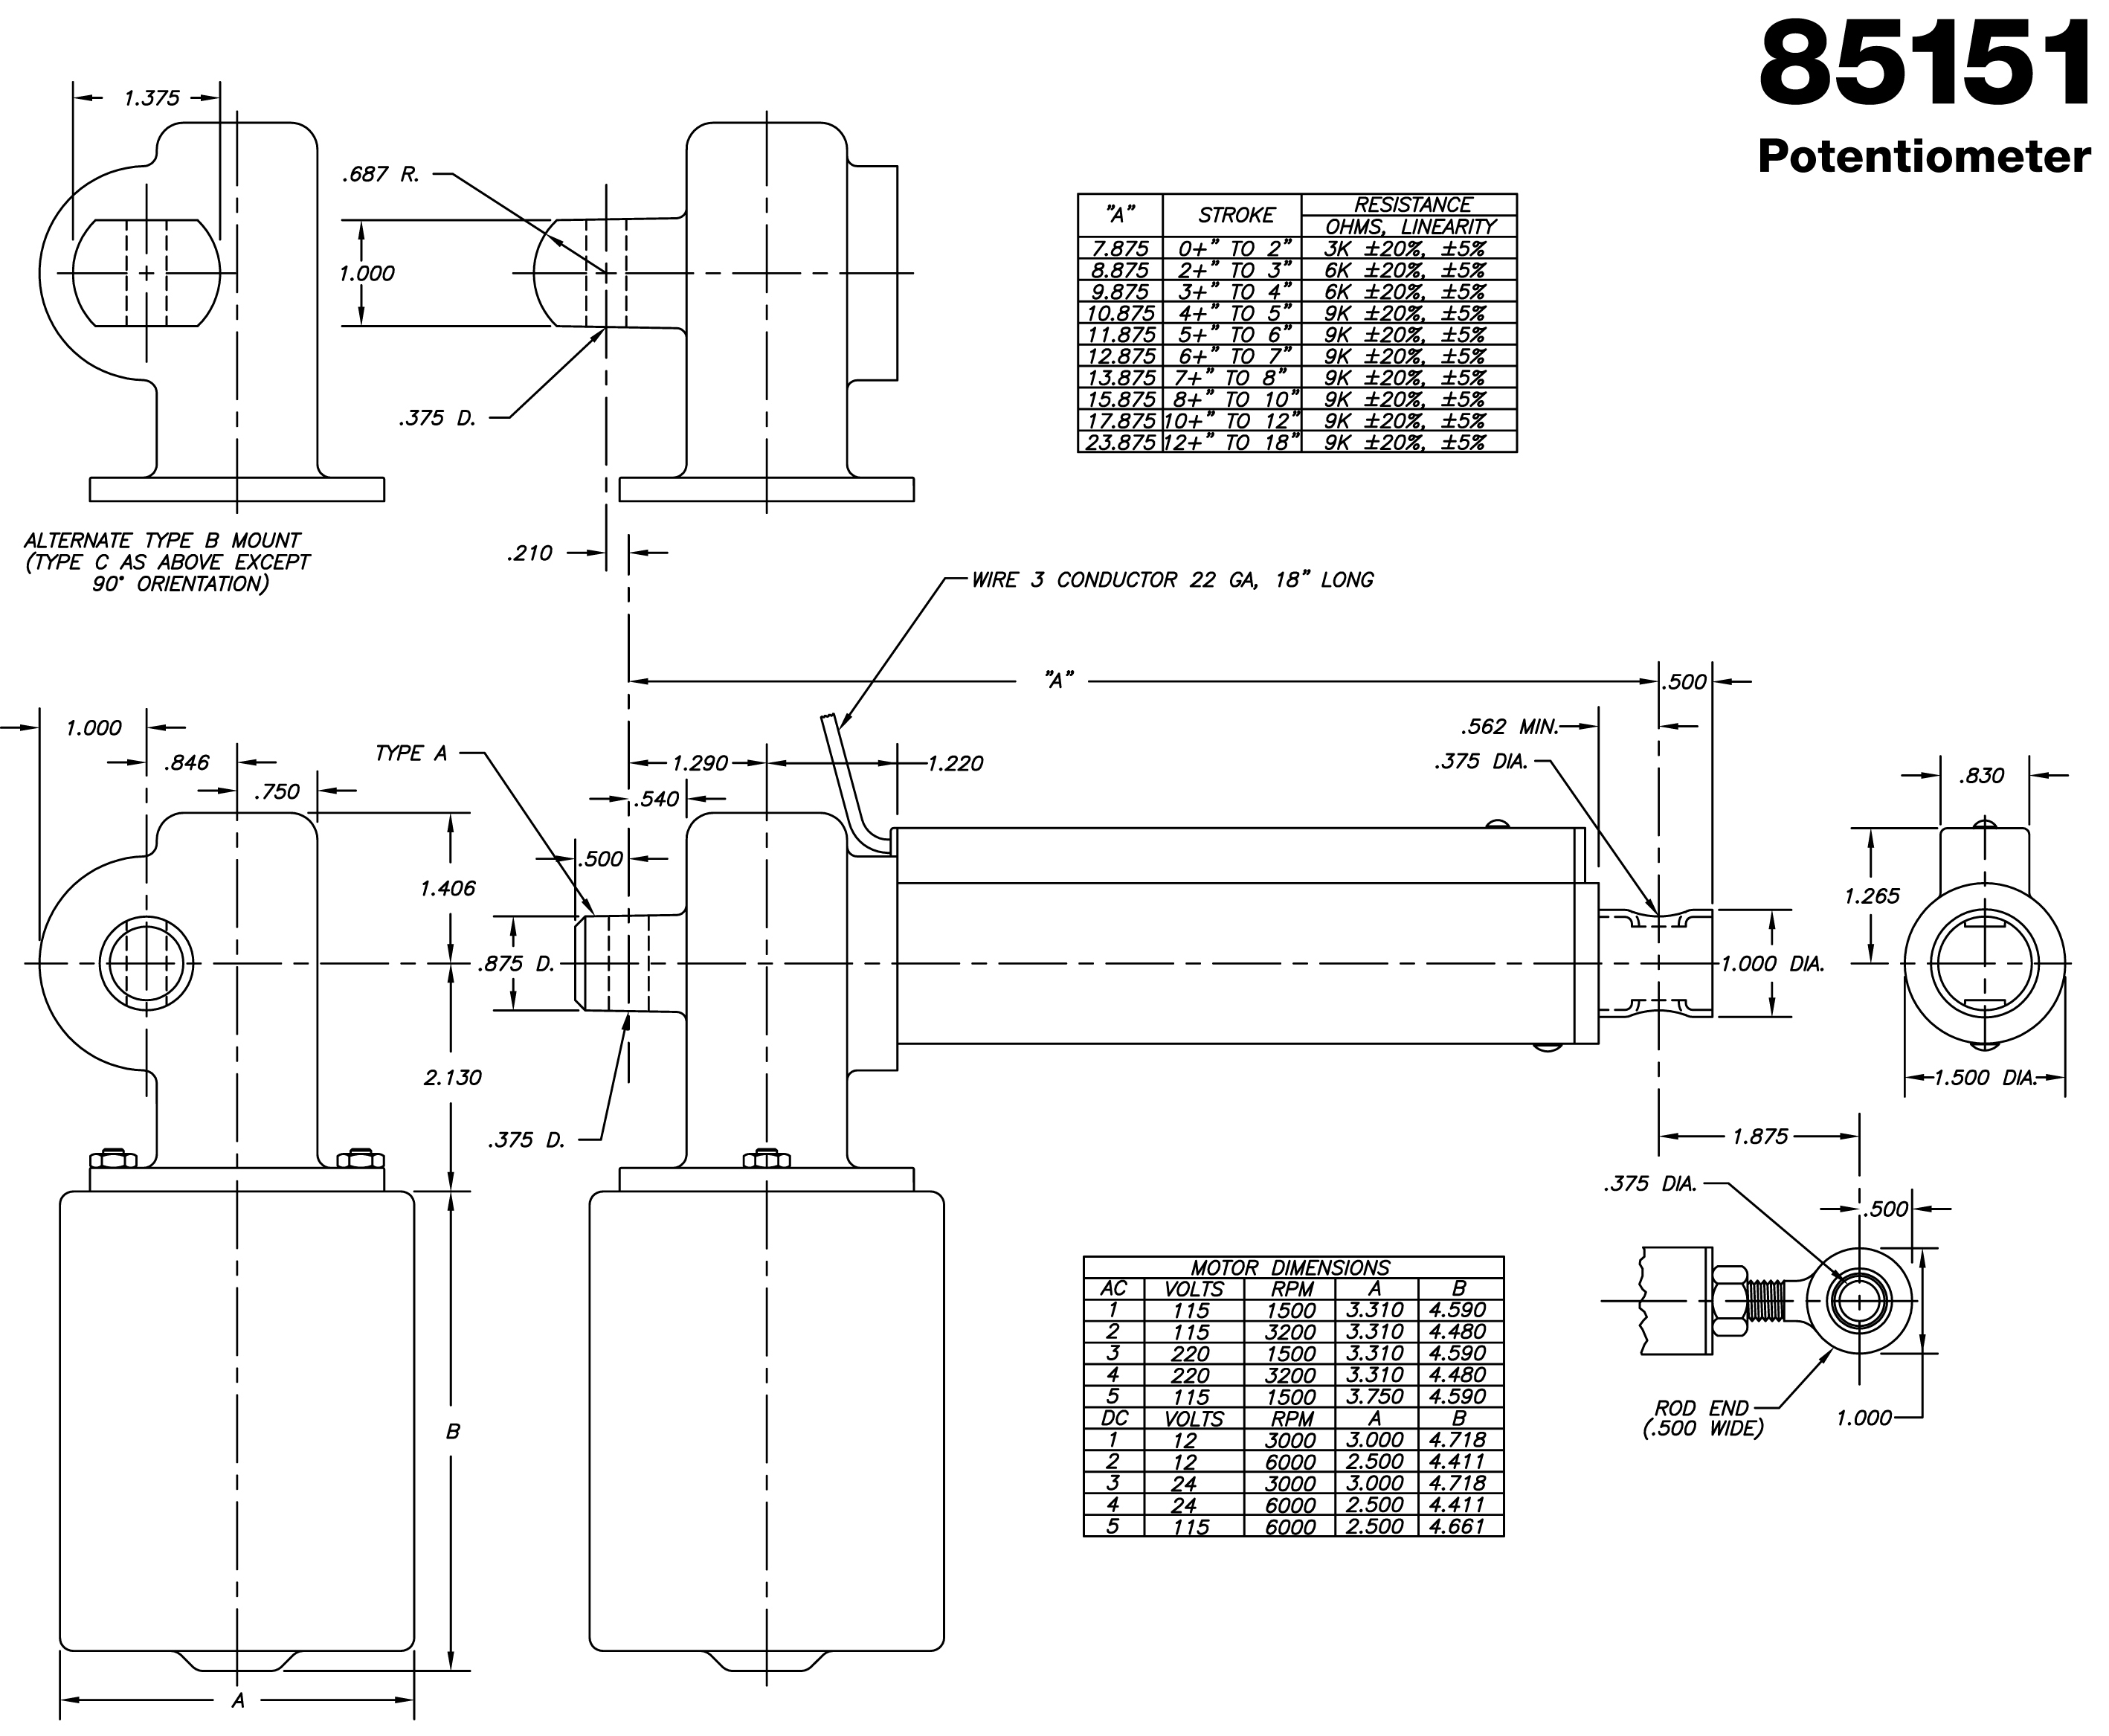 linear actuator wiring diagram gallery wiring diagram sample. Black Bedroom Furniture Sets. Home Design Ideas